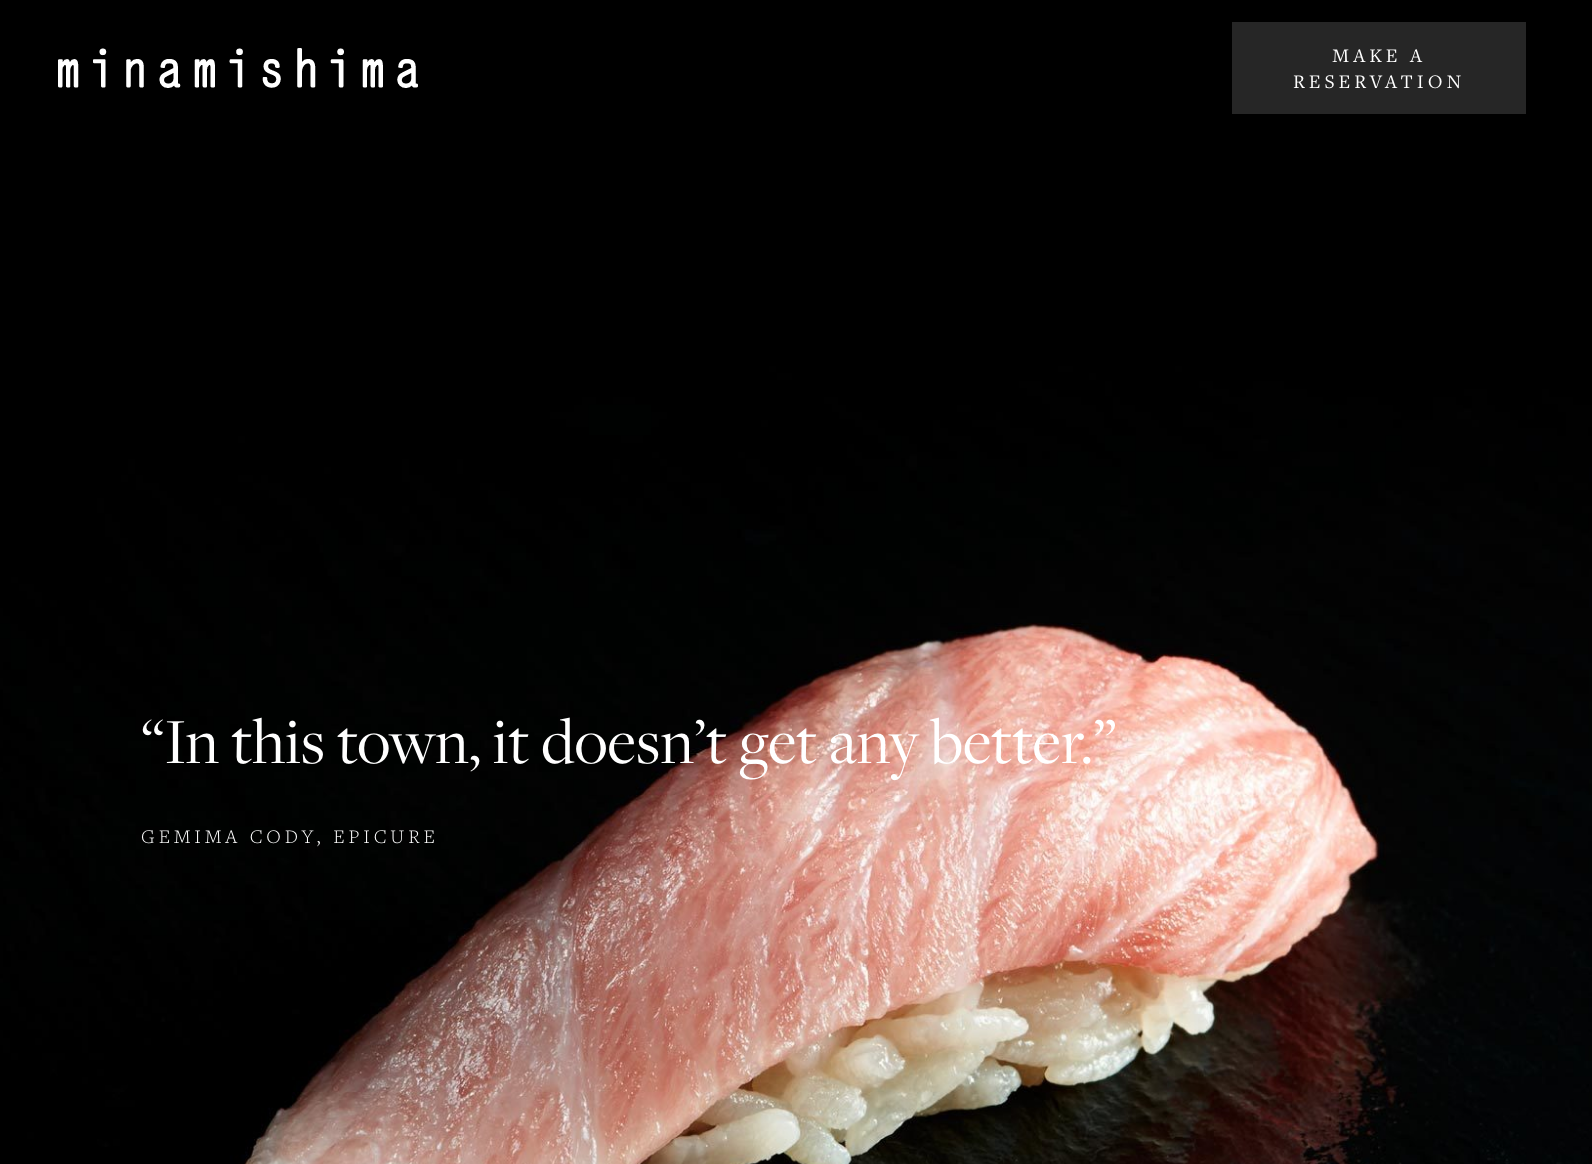 minamishima.png